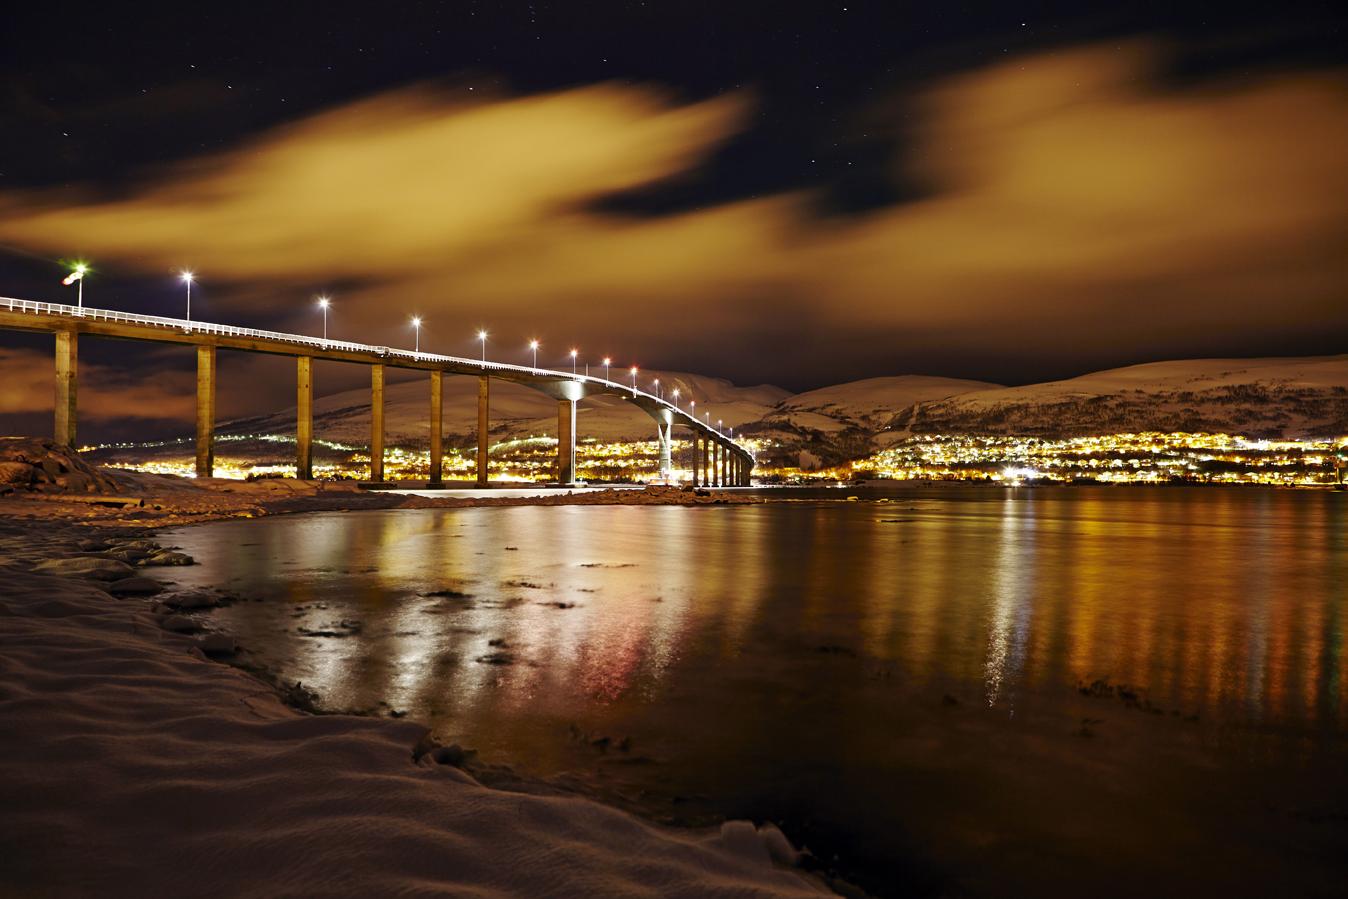 Bridge to Kvaløysletta